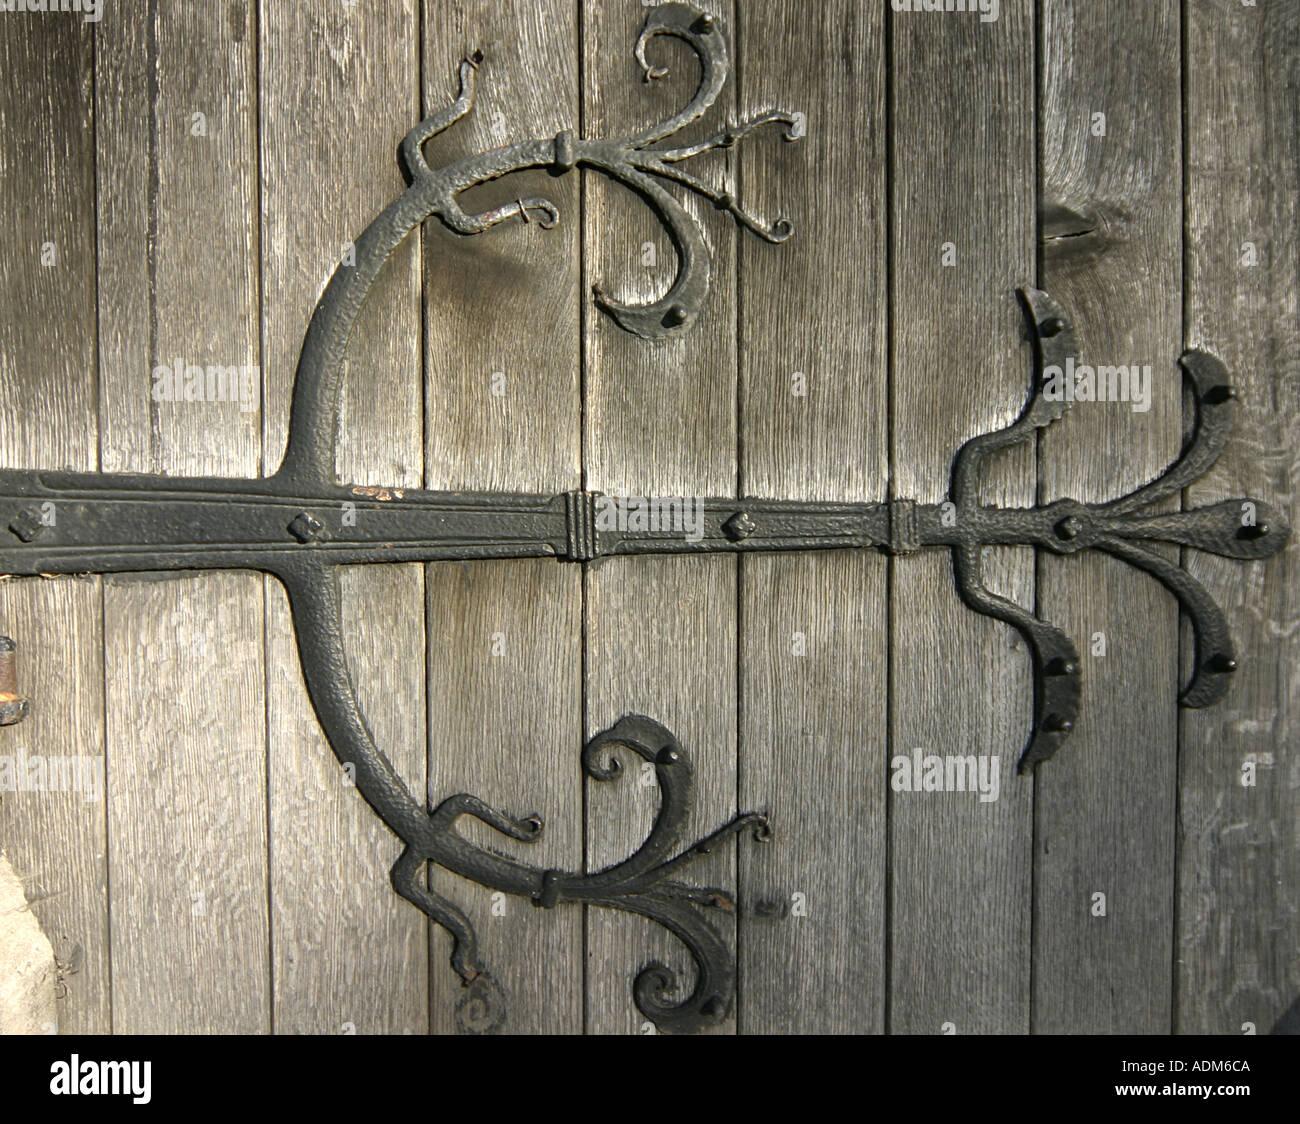 Decorative hinge on a church door at Hedon Humberside & Decorative hinge on a church door at Hedon Humberside Stock Photo ... pezcame.com